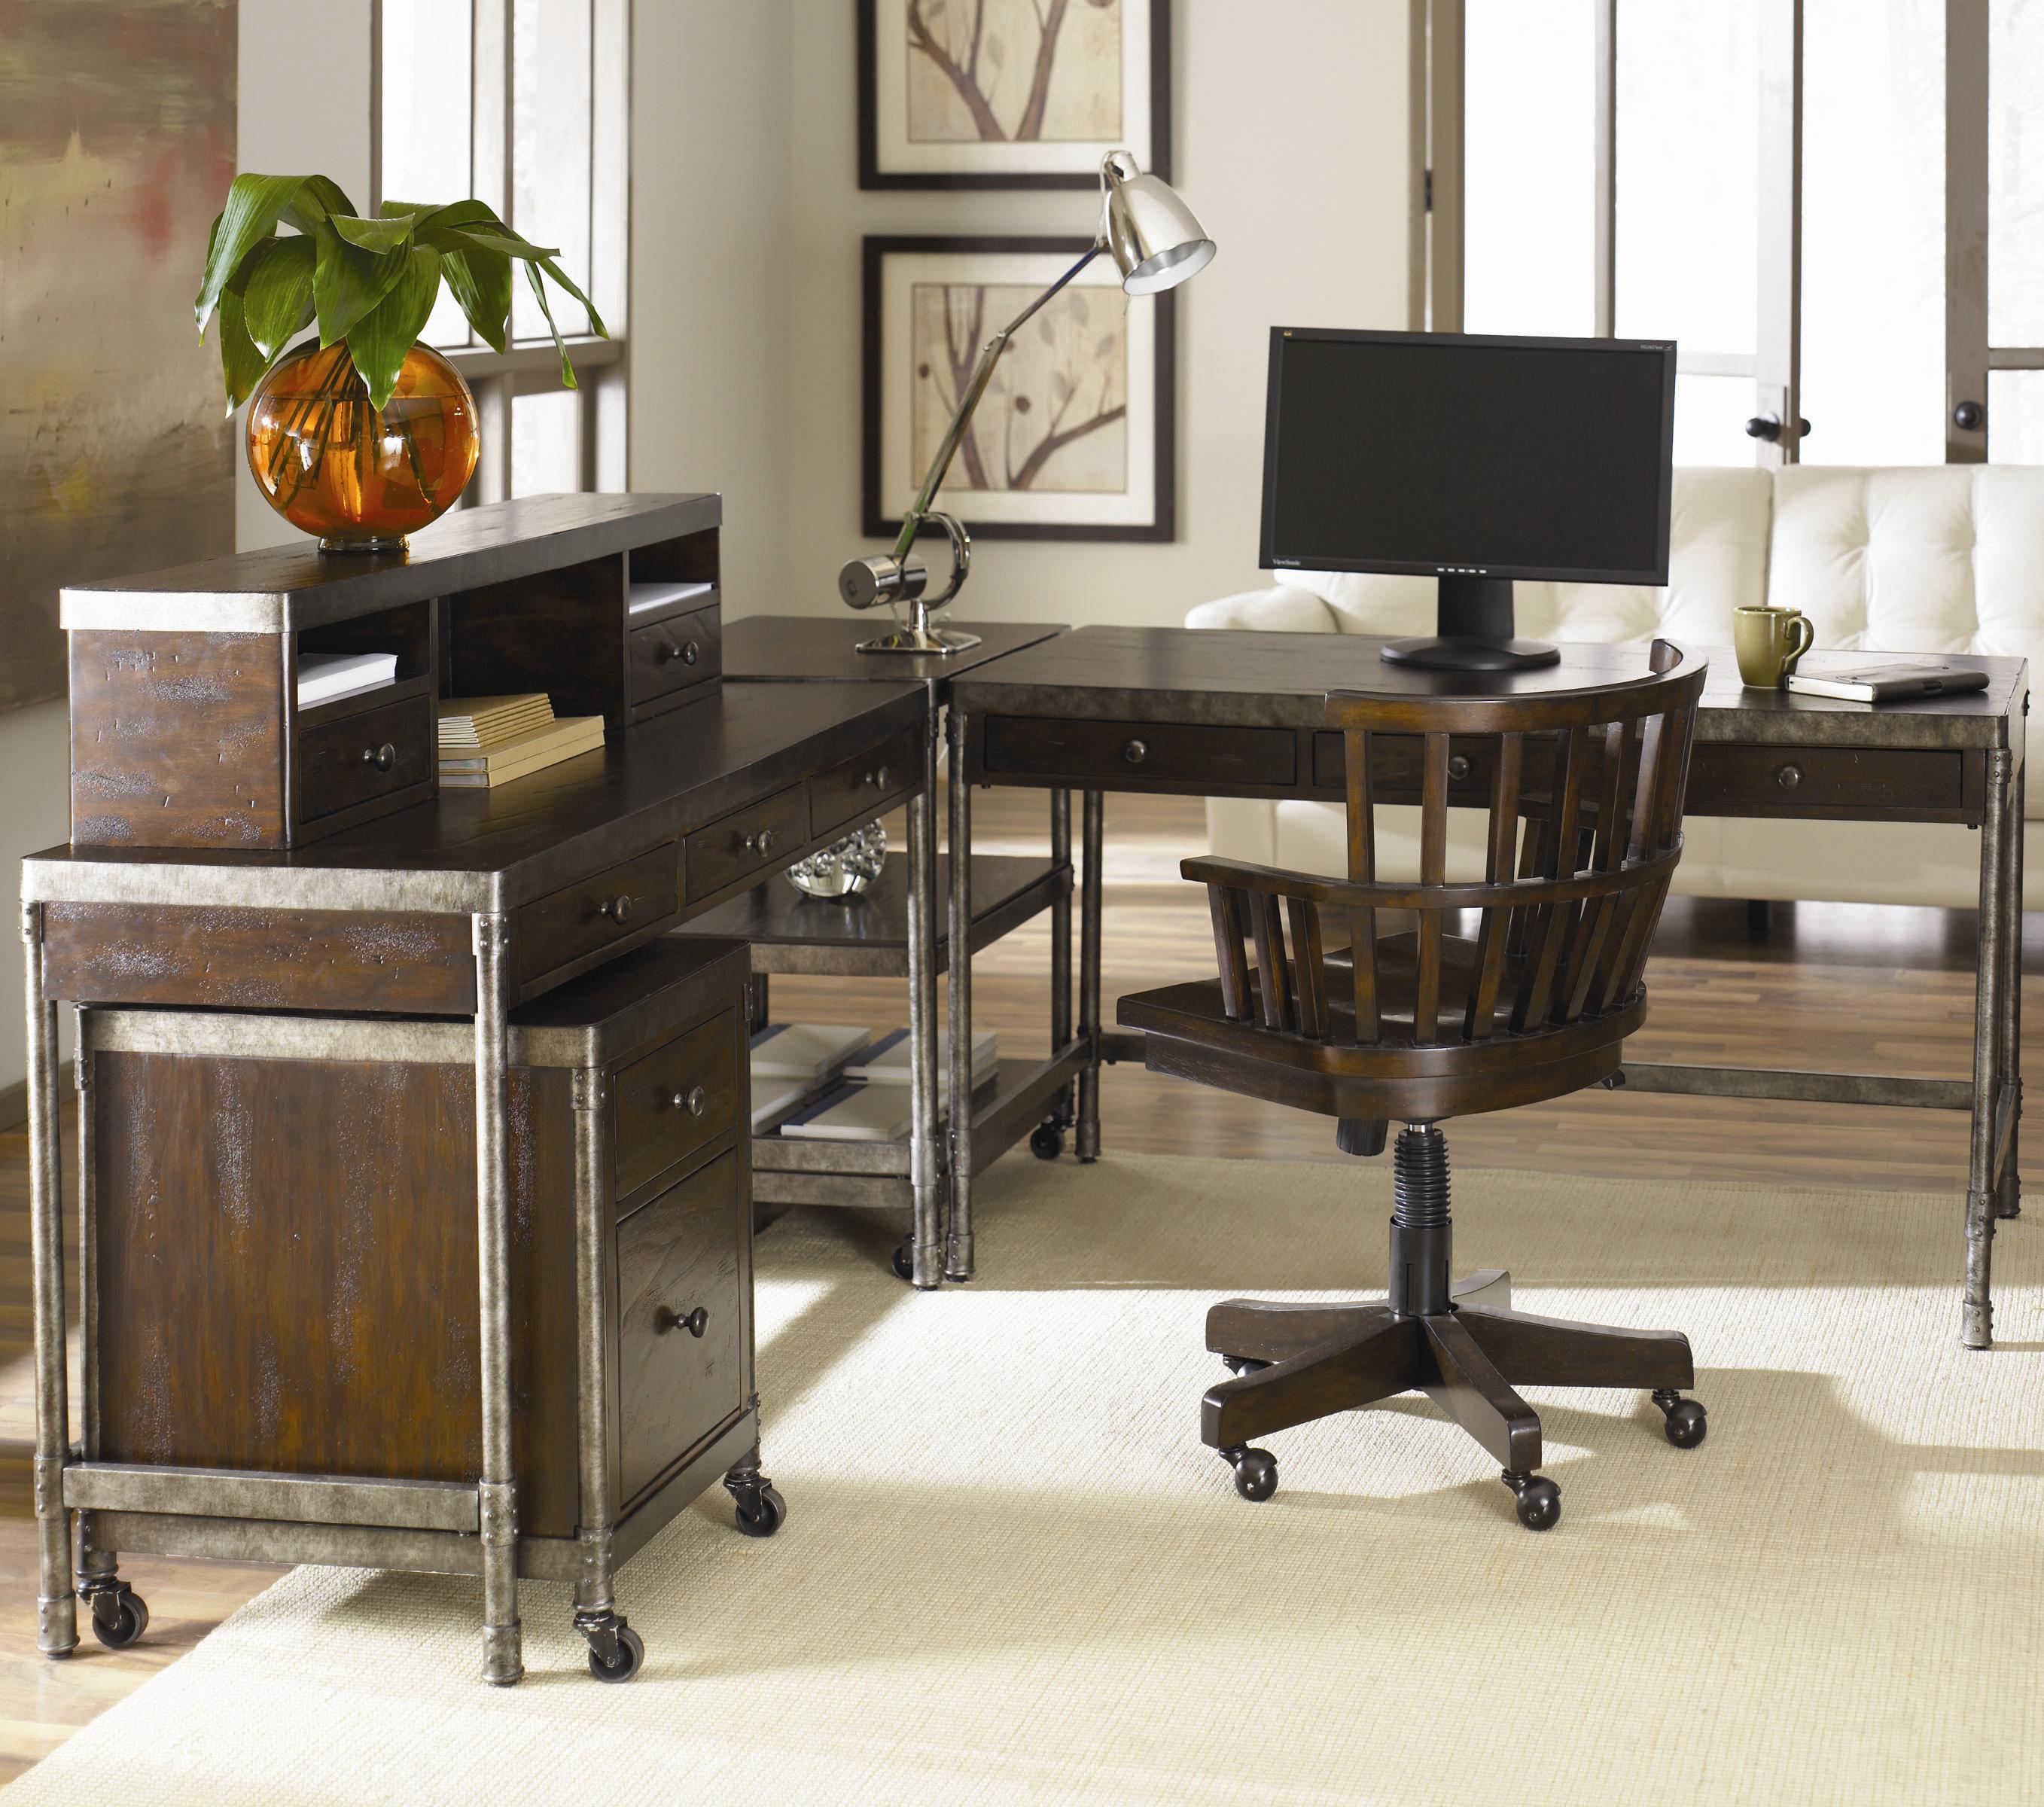 Metal puter Desk w Hutch by Hammary